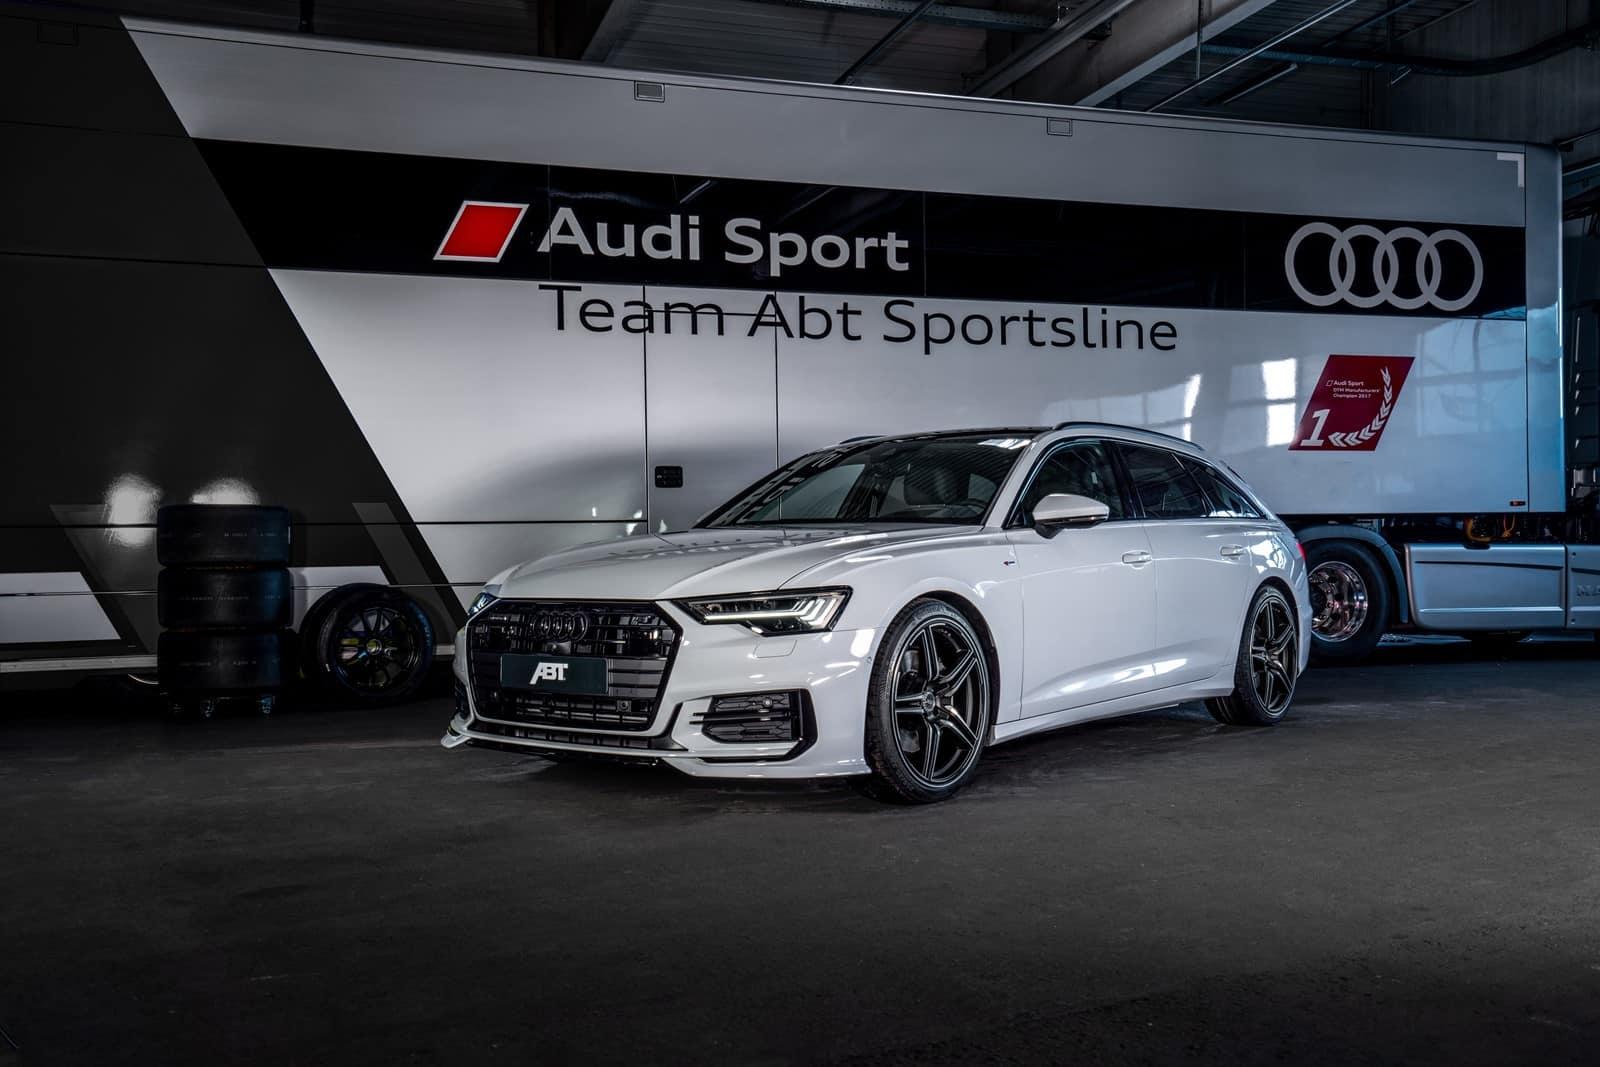 Audi-A6-Avant-ABT-aero-package-4.jpg